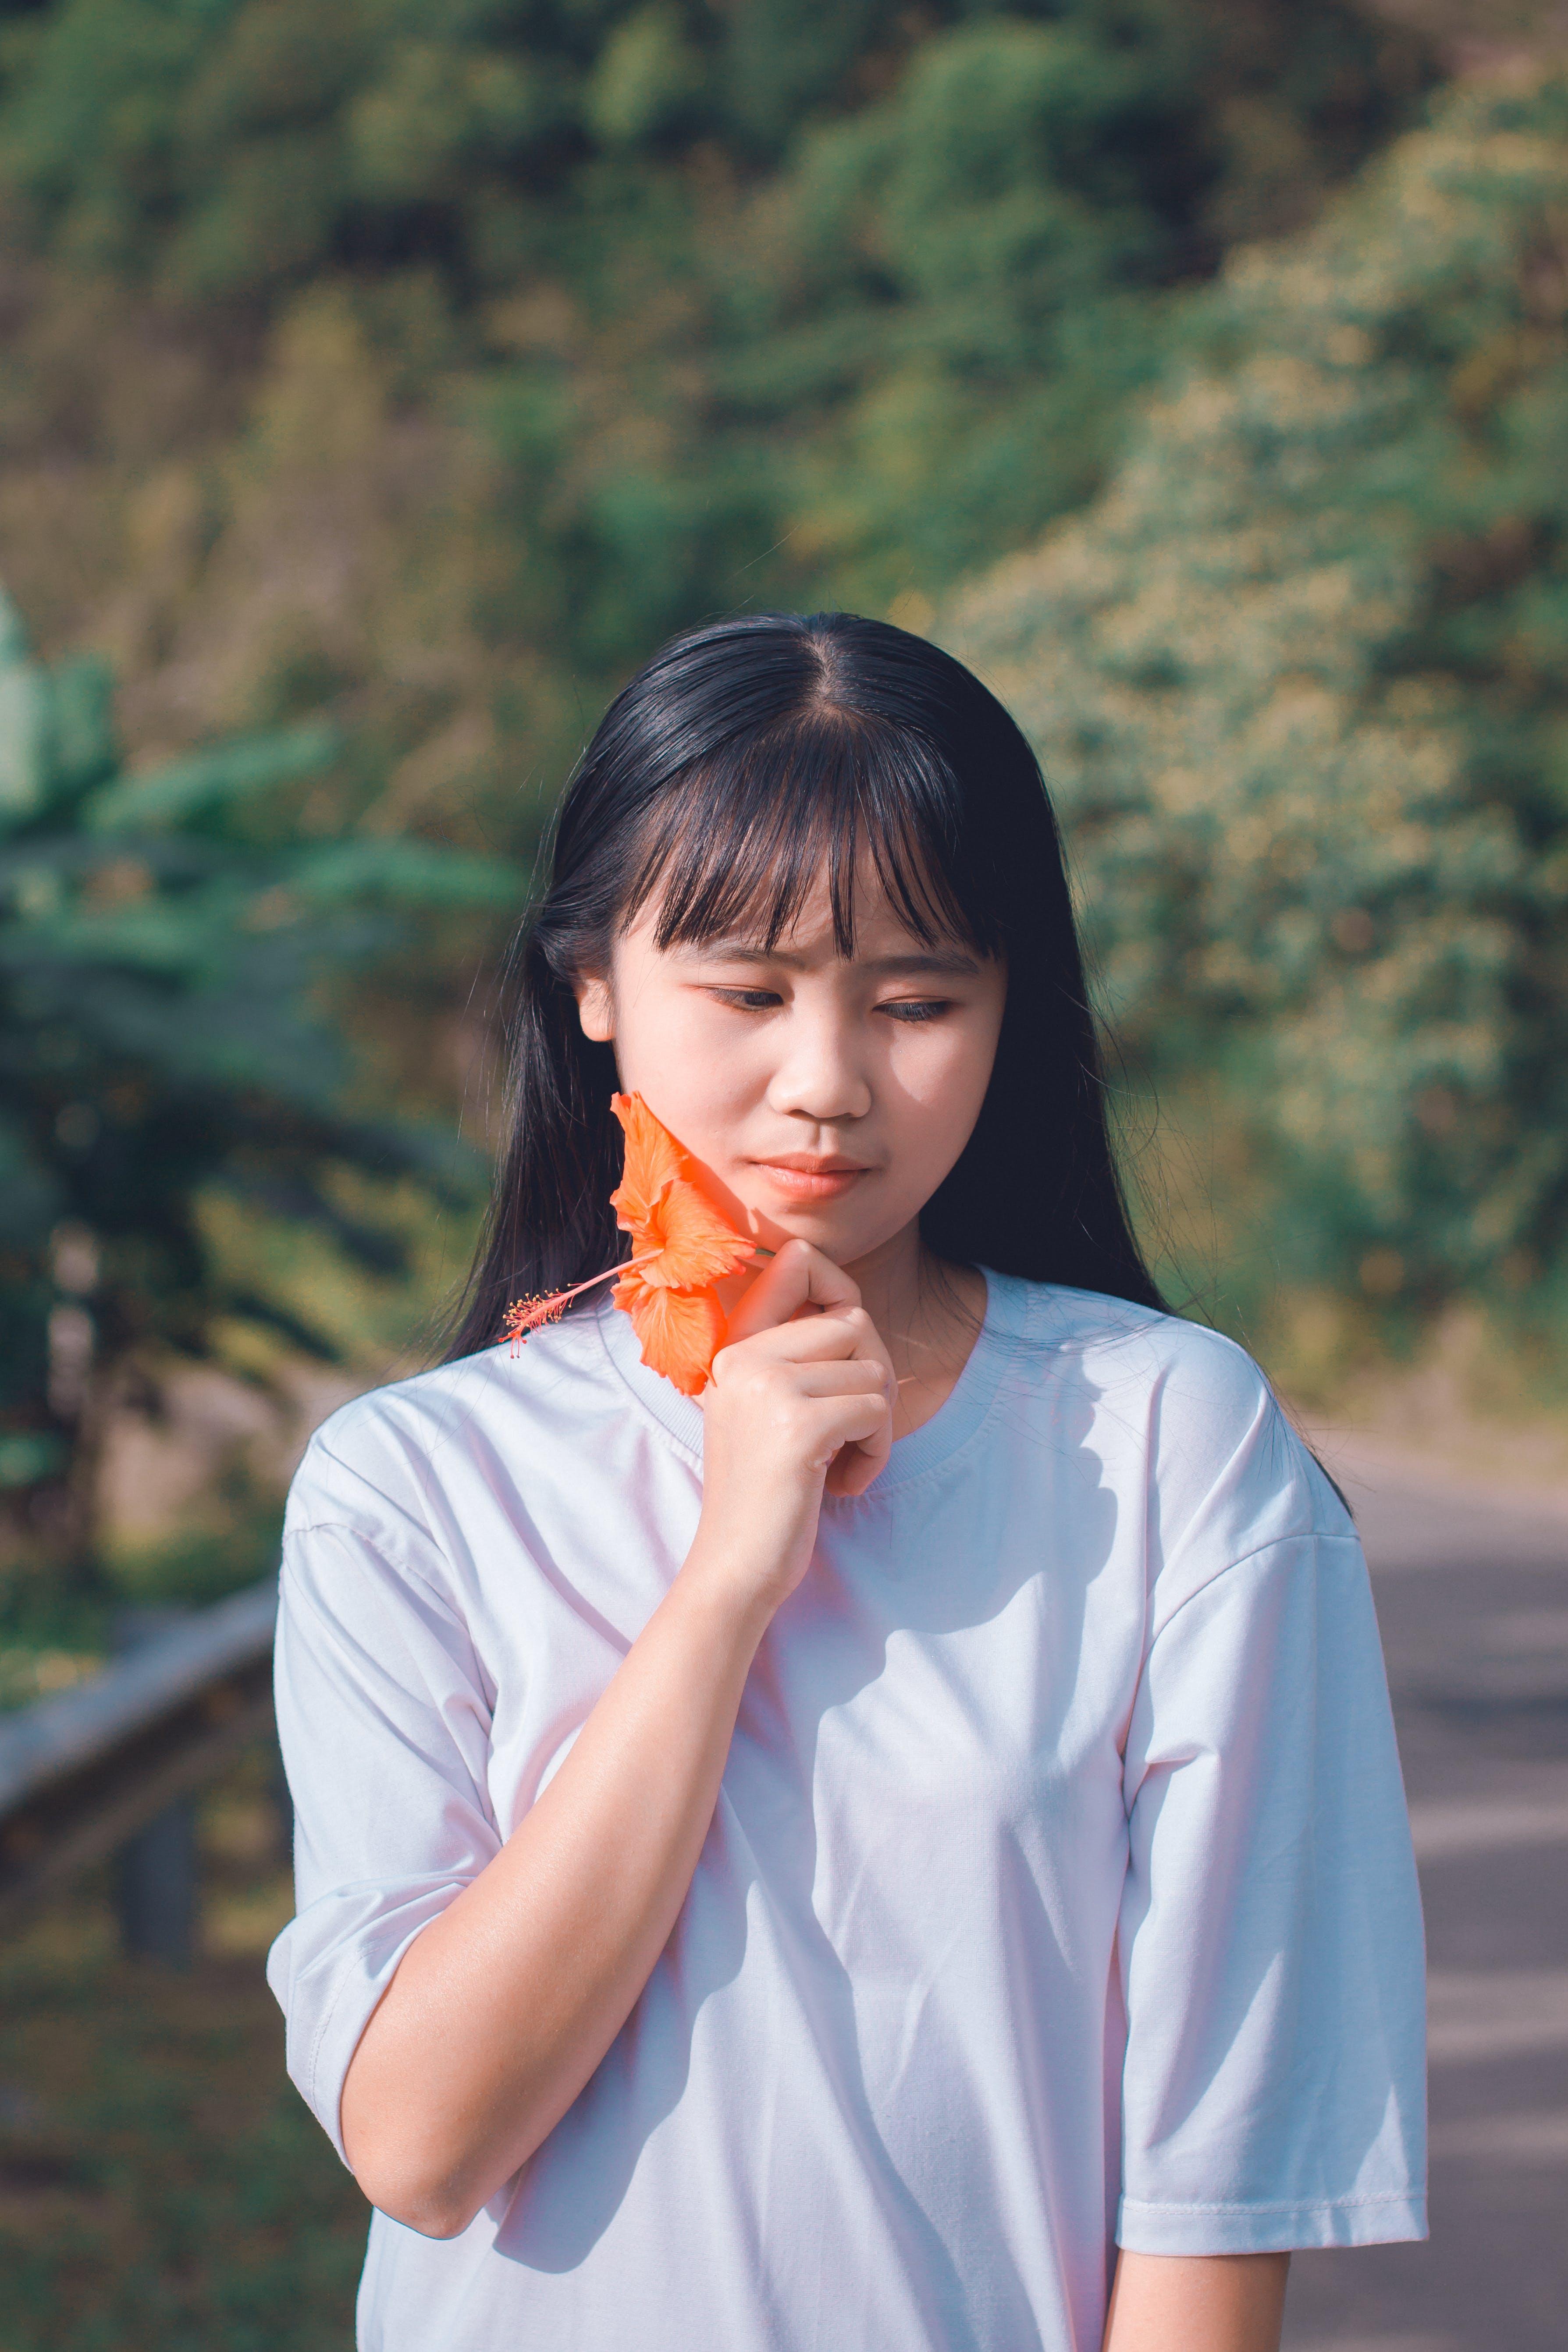 Woman Holding Orange Hibiscus Flower